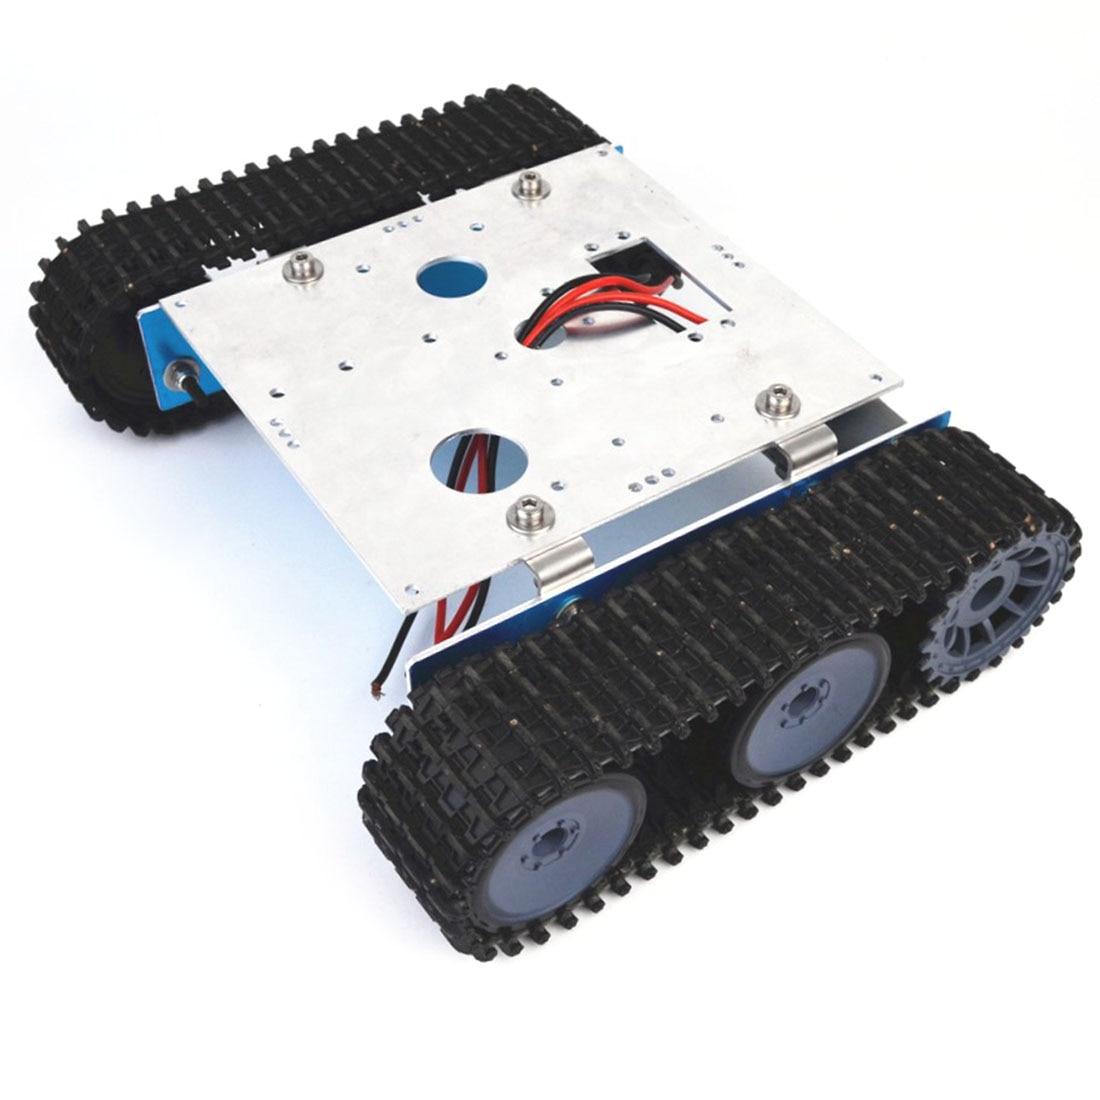 DIY Aluminium Alloy Tank Robot Caterpillar Vehicle Platform Chassis Assembly Kit For Arduino Kids Birthdaty Gifts